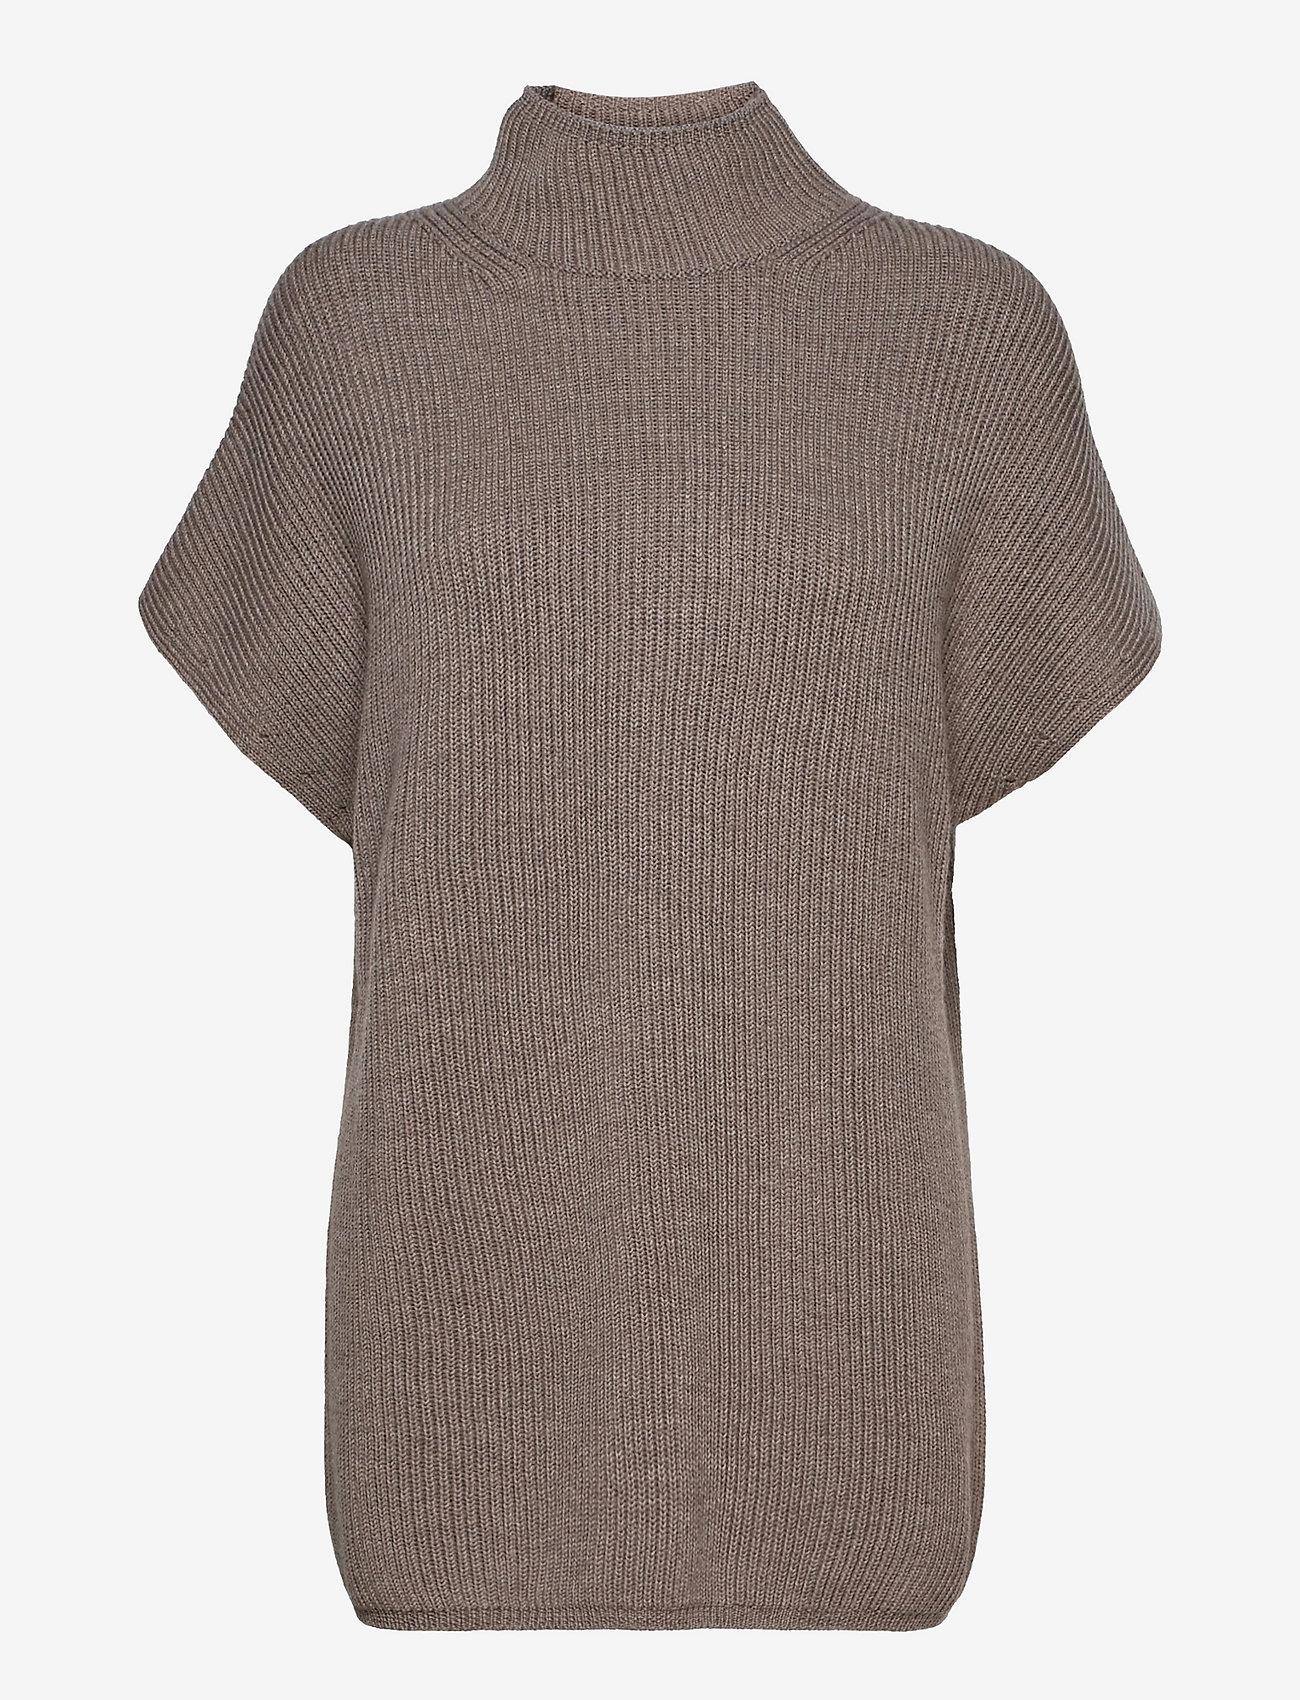 Max Mara Leisure - OBLATO - knitted dresses - turtledove - 0